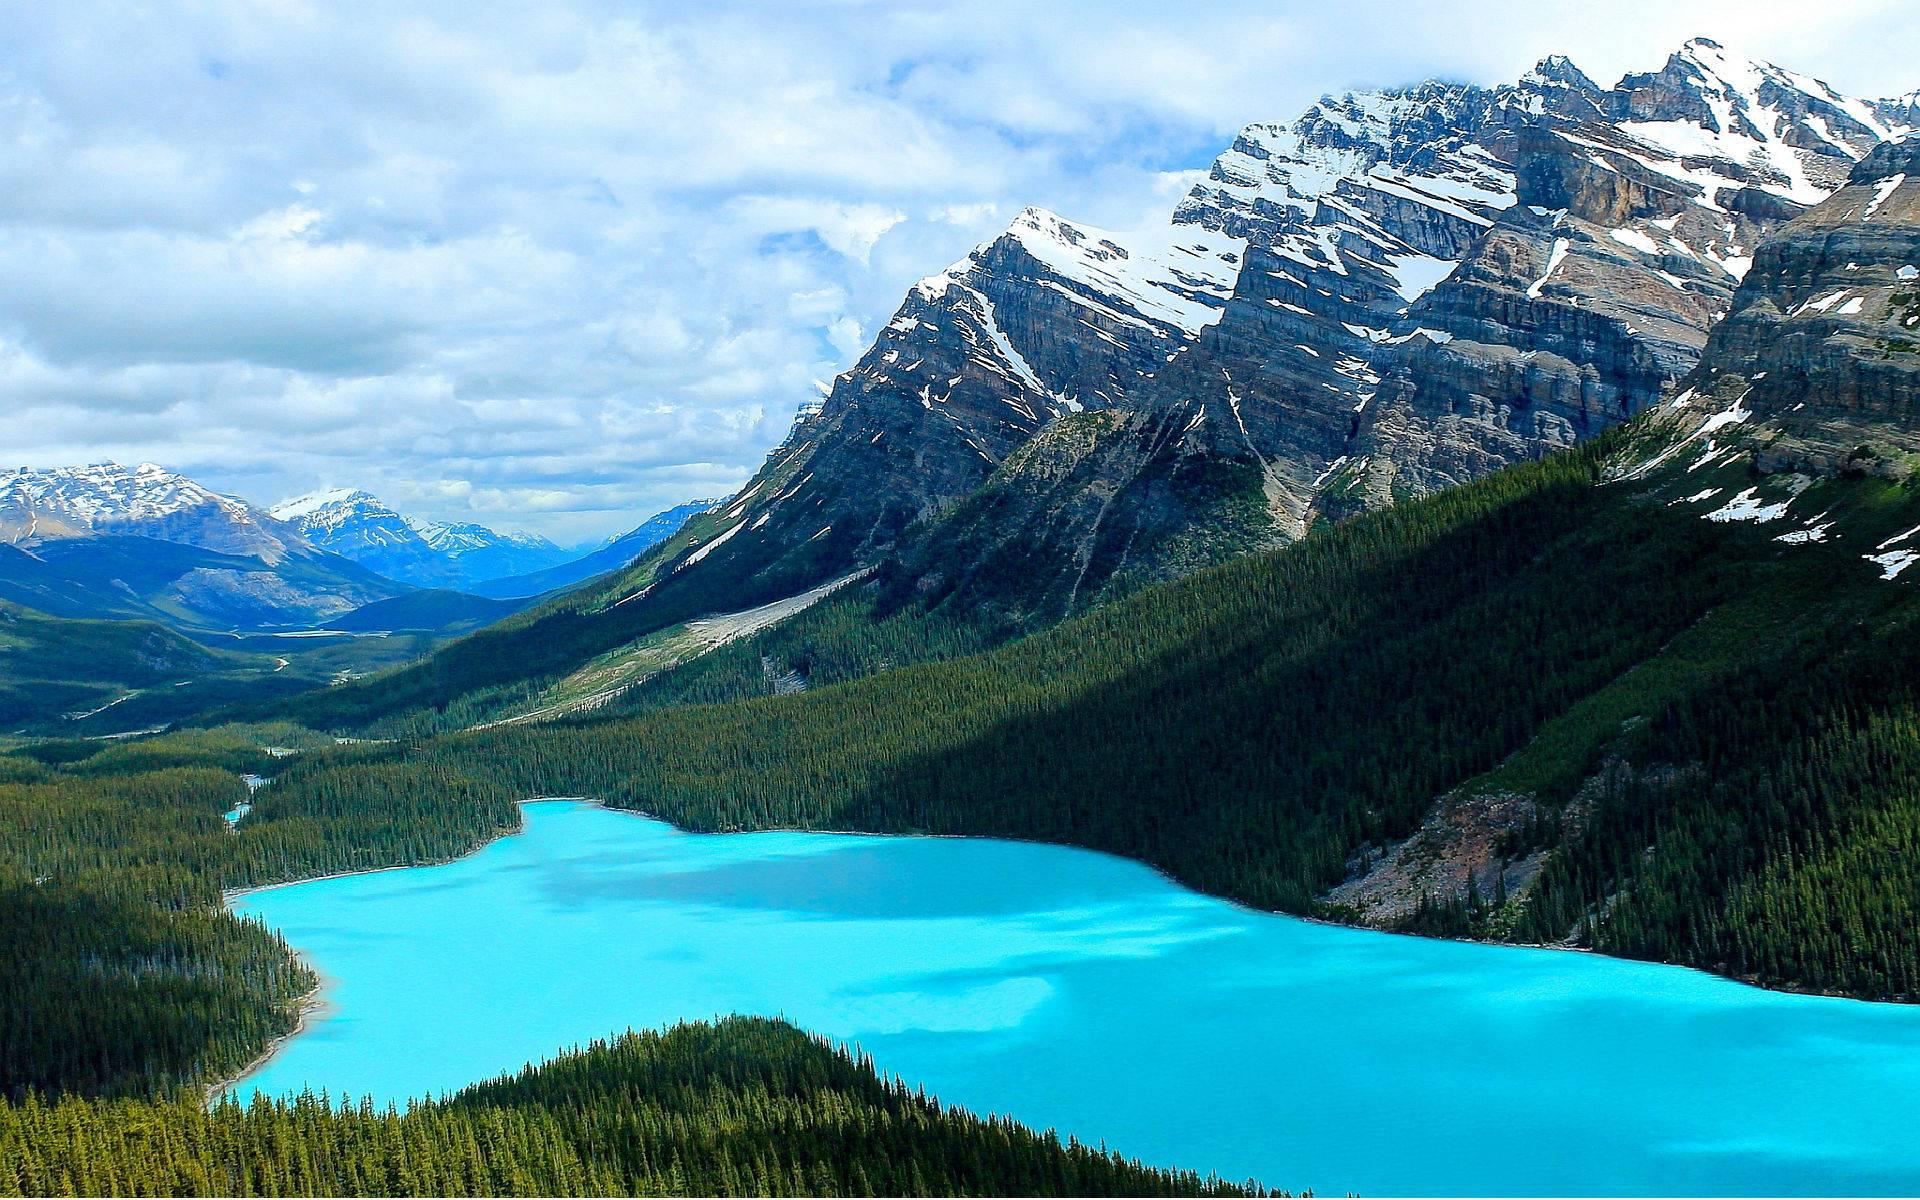 6-Day VIA Rail Tour of Vancouver, Lake Louise, Jasper, Glacier View and Rocky Mountains